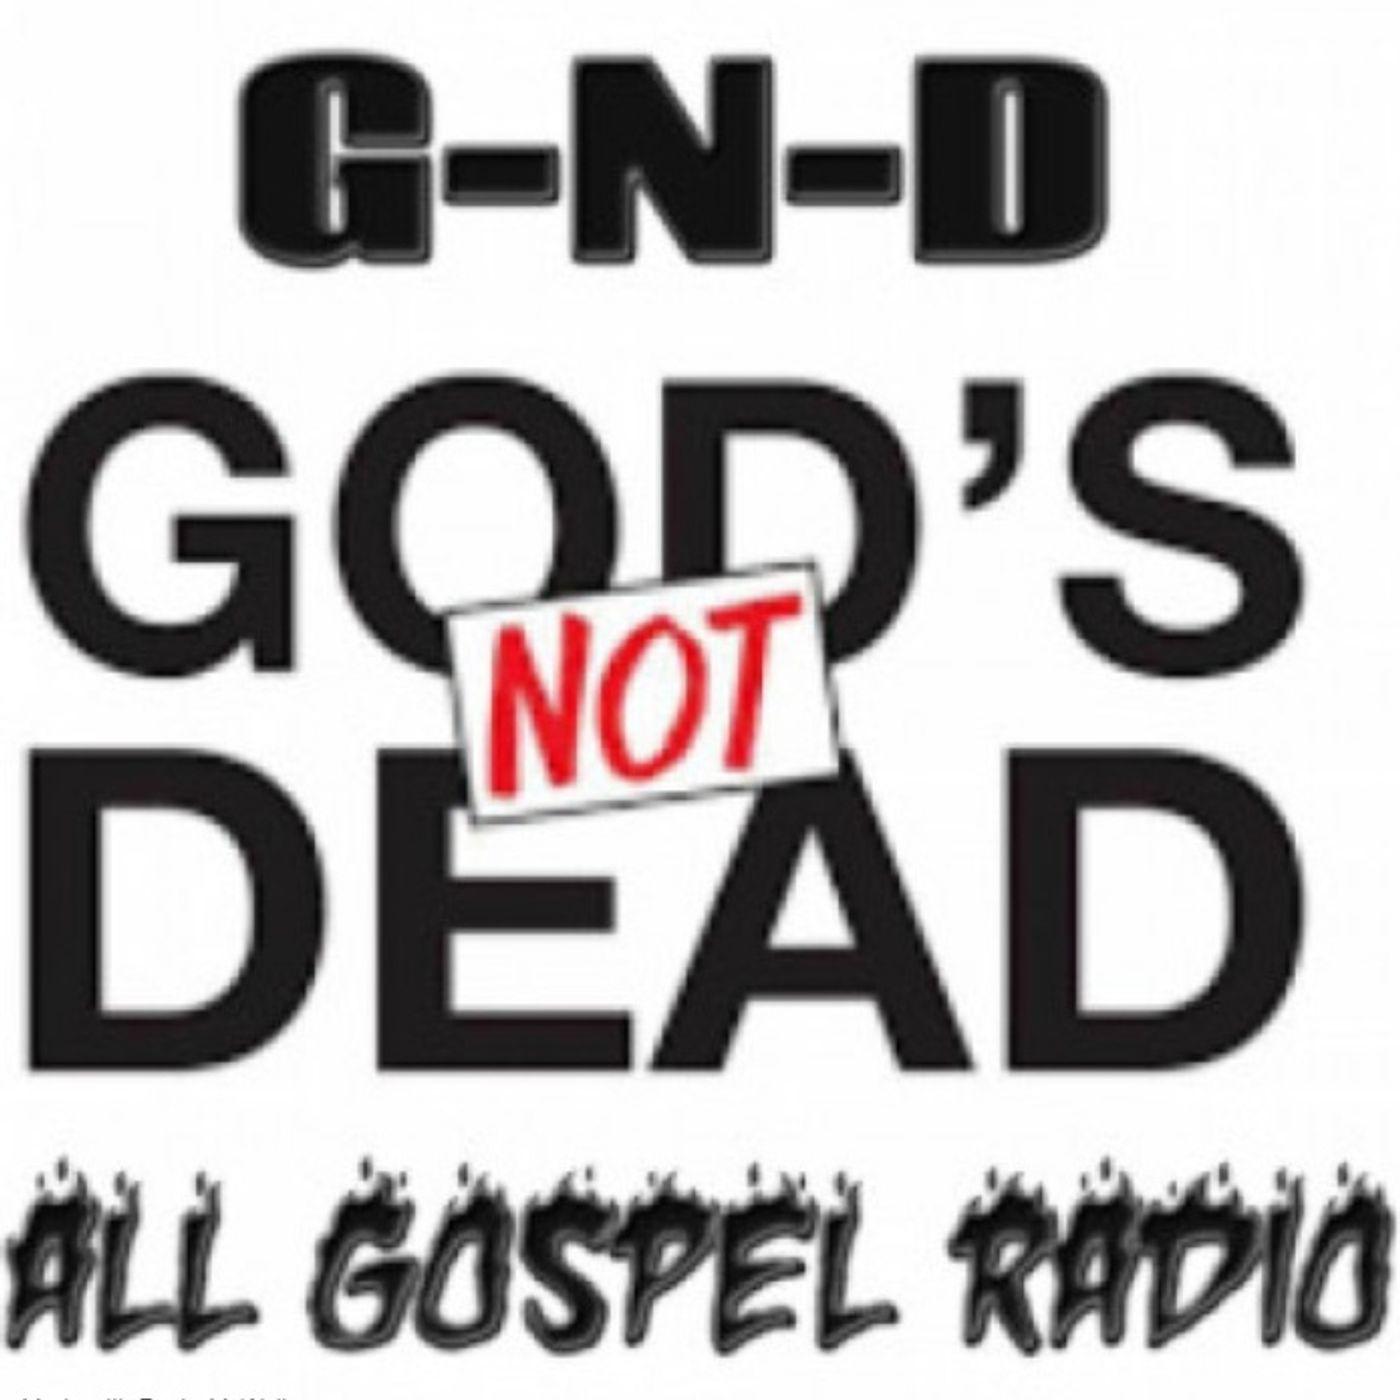 "G-N-D: All gospel radio: ""God's Not Dead:G.N.D All Gospel Radio"